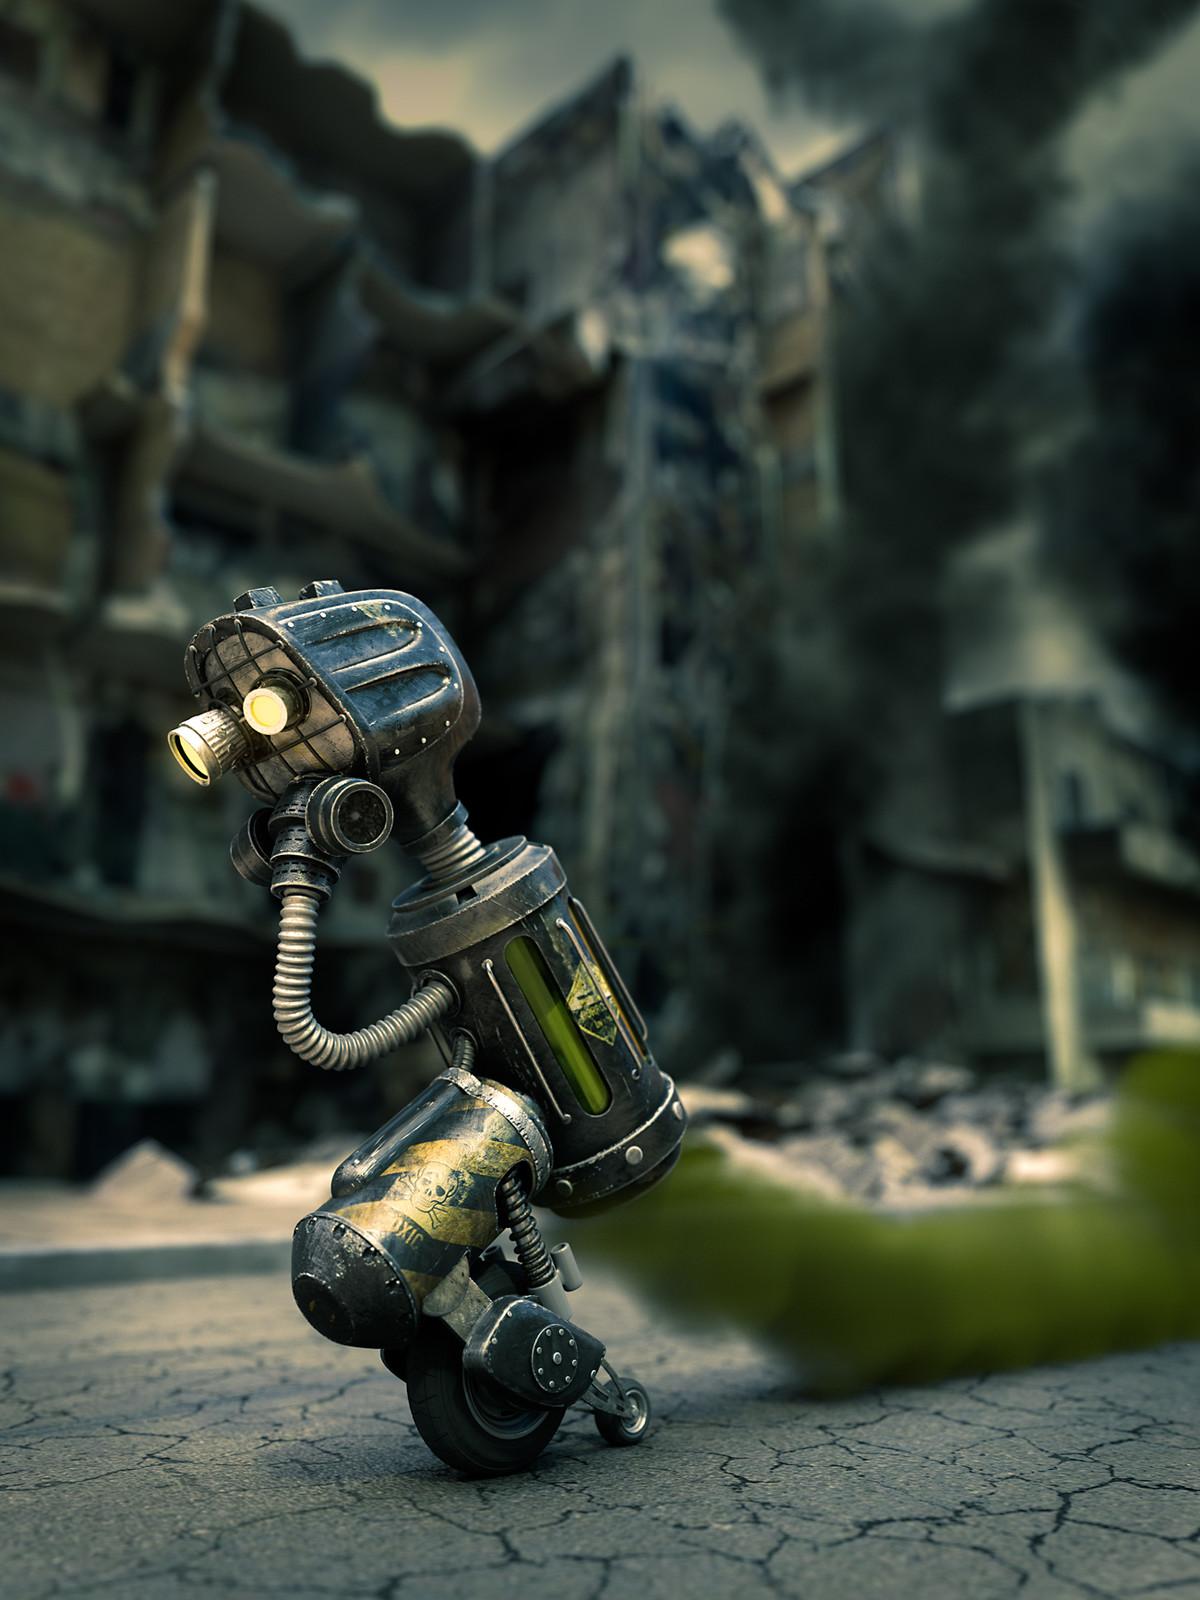 Toxic Robot